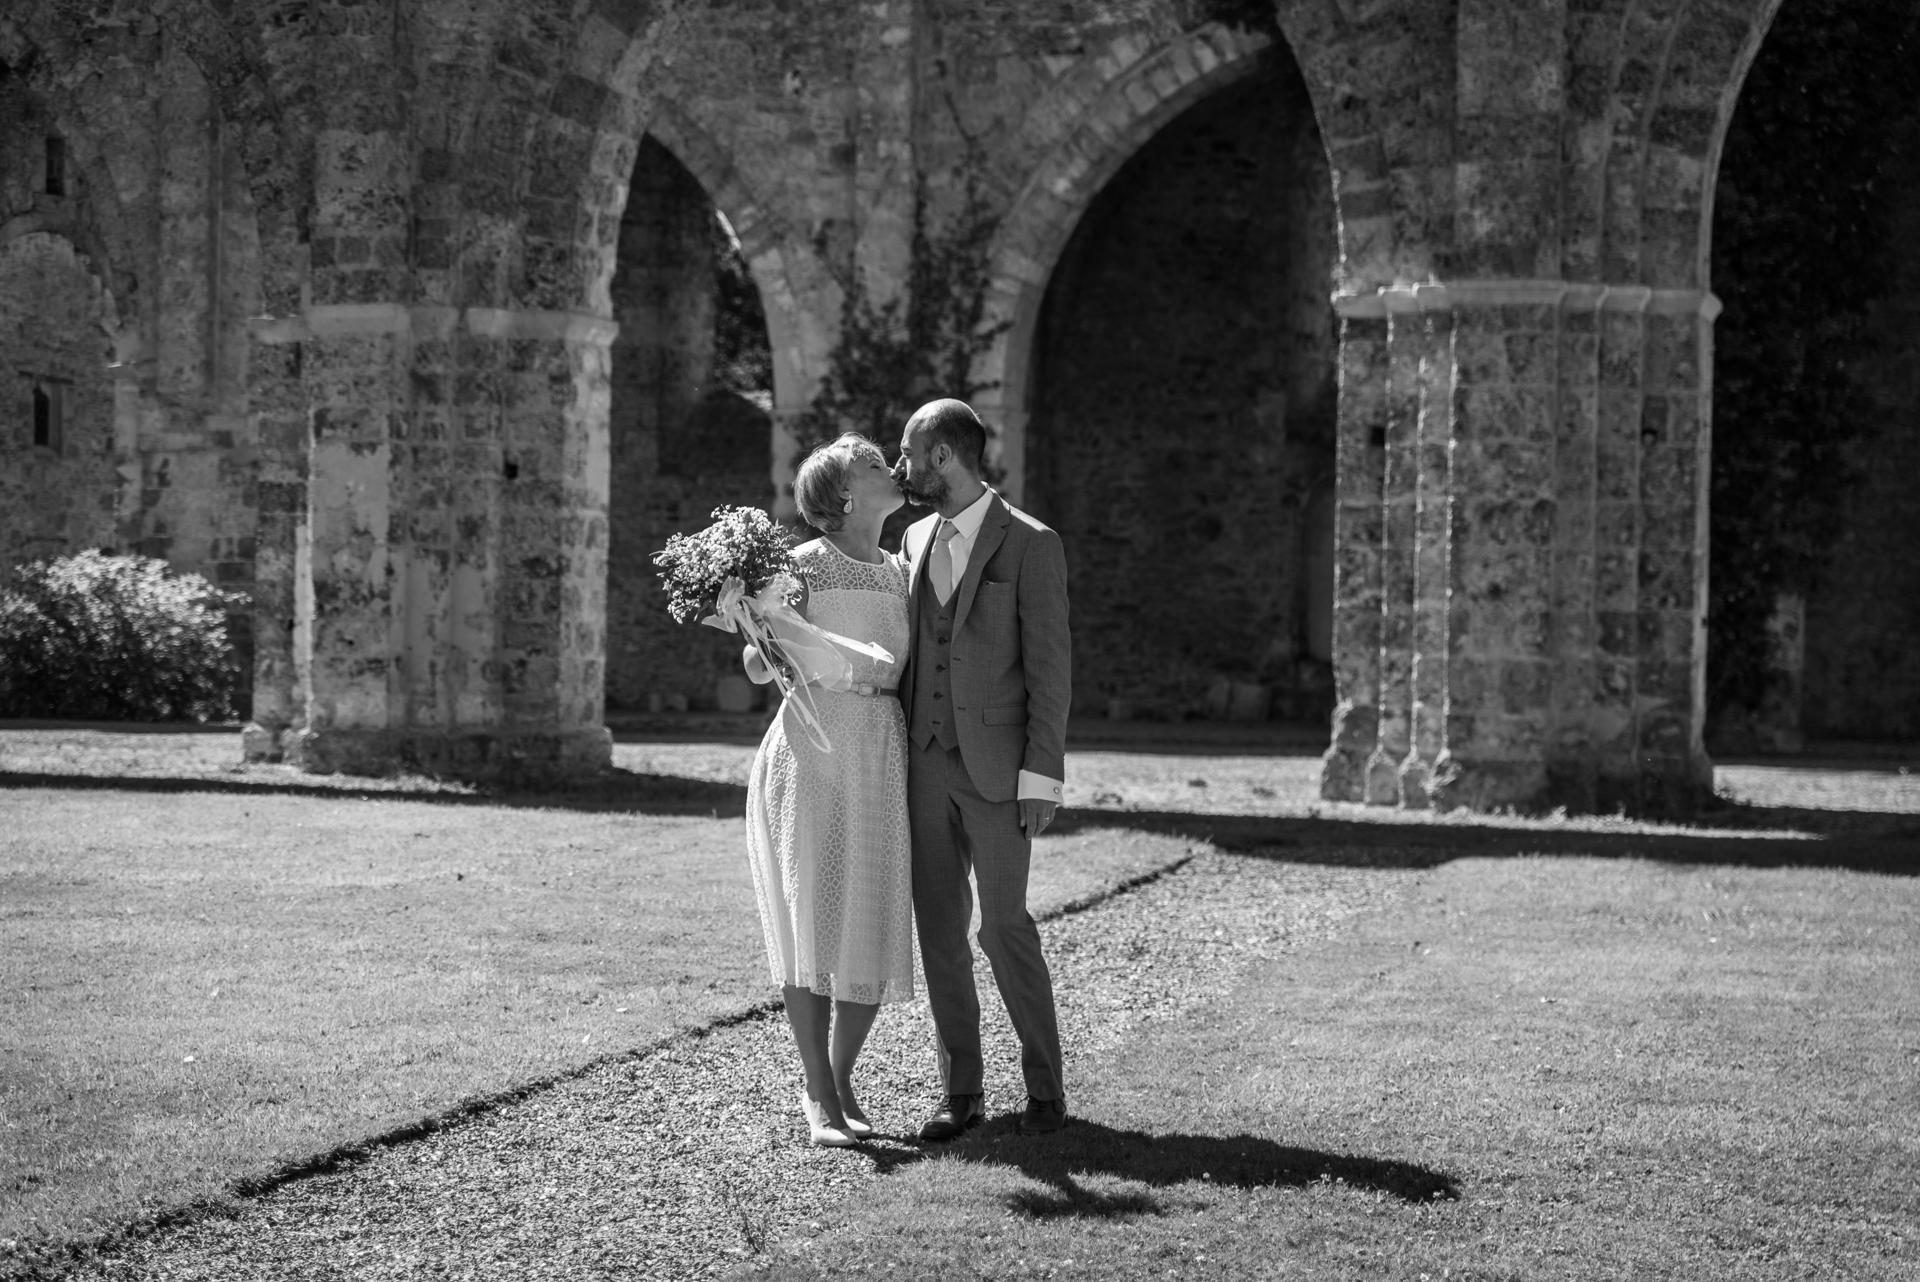 Mariage-Abbaye-Vaux-Cernay-Arnauddphotography